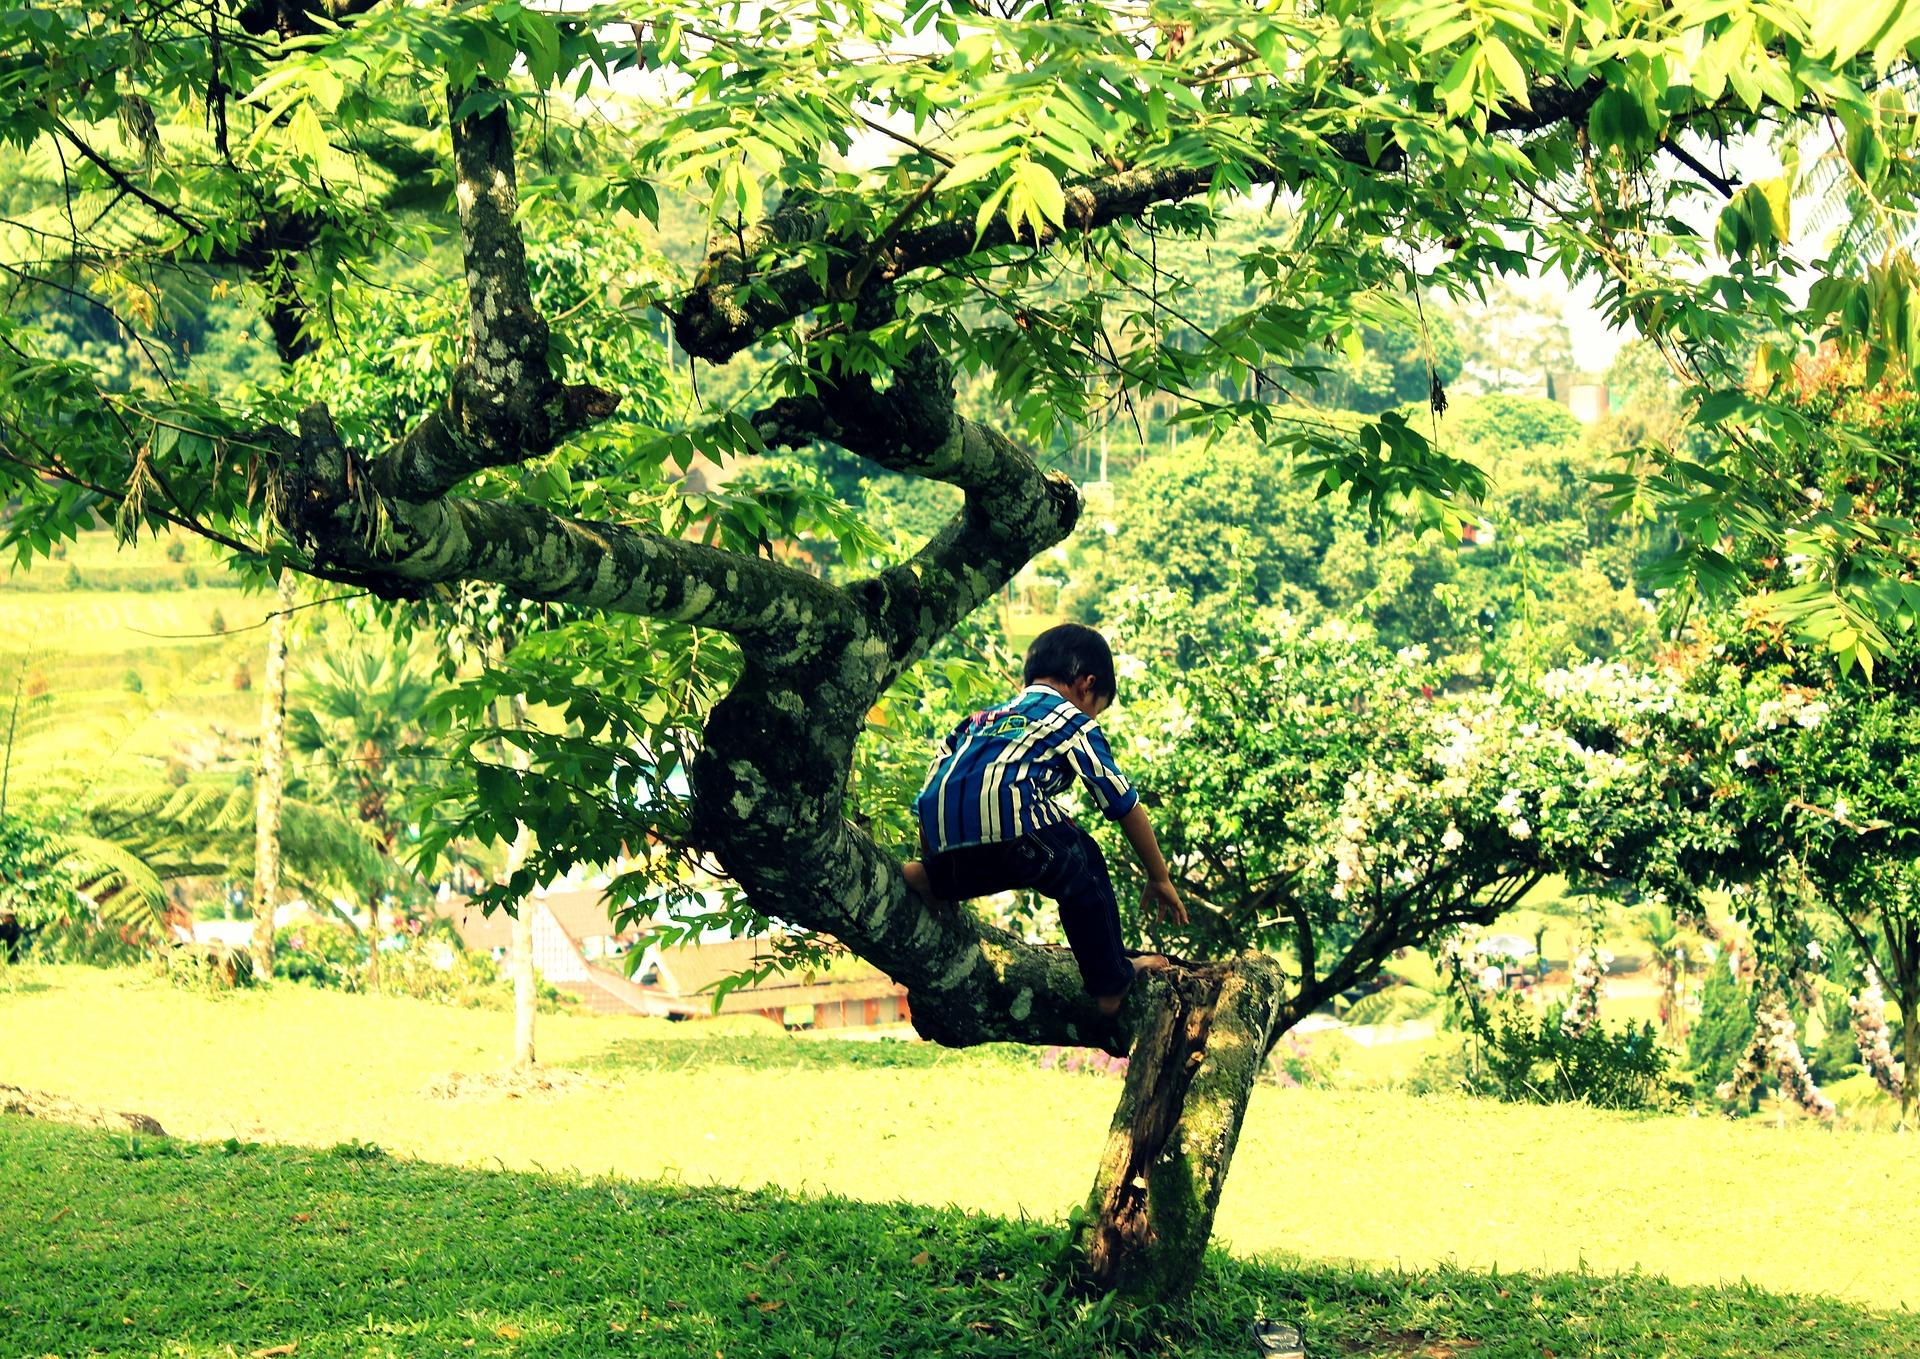 tree climbing kid-1737737_1920